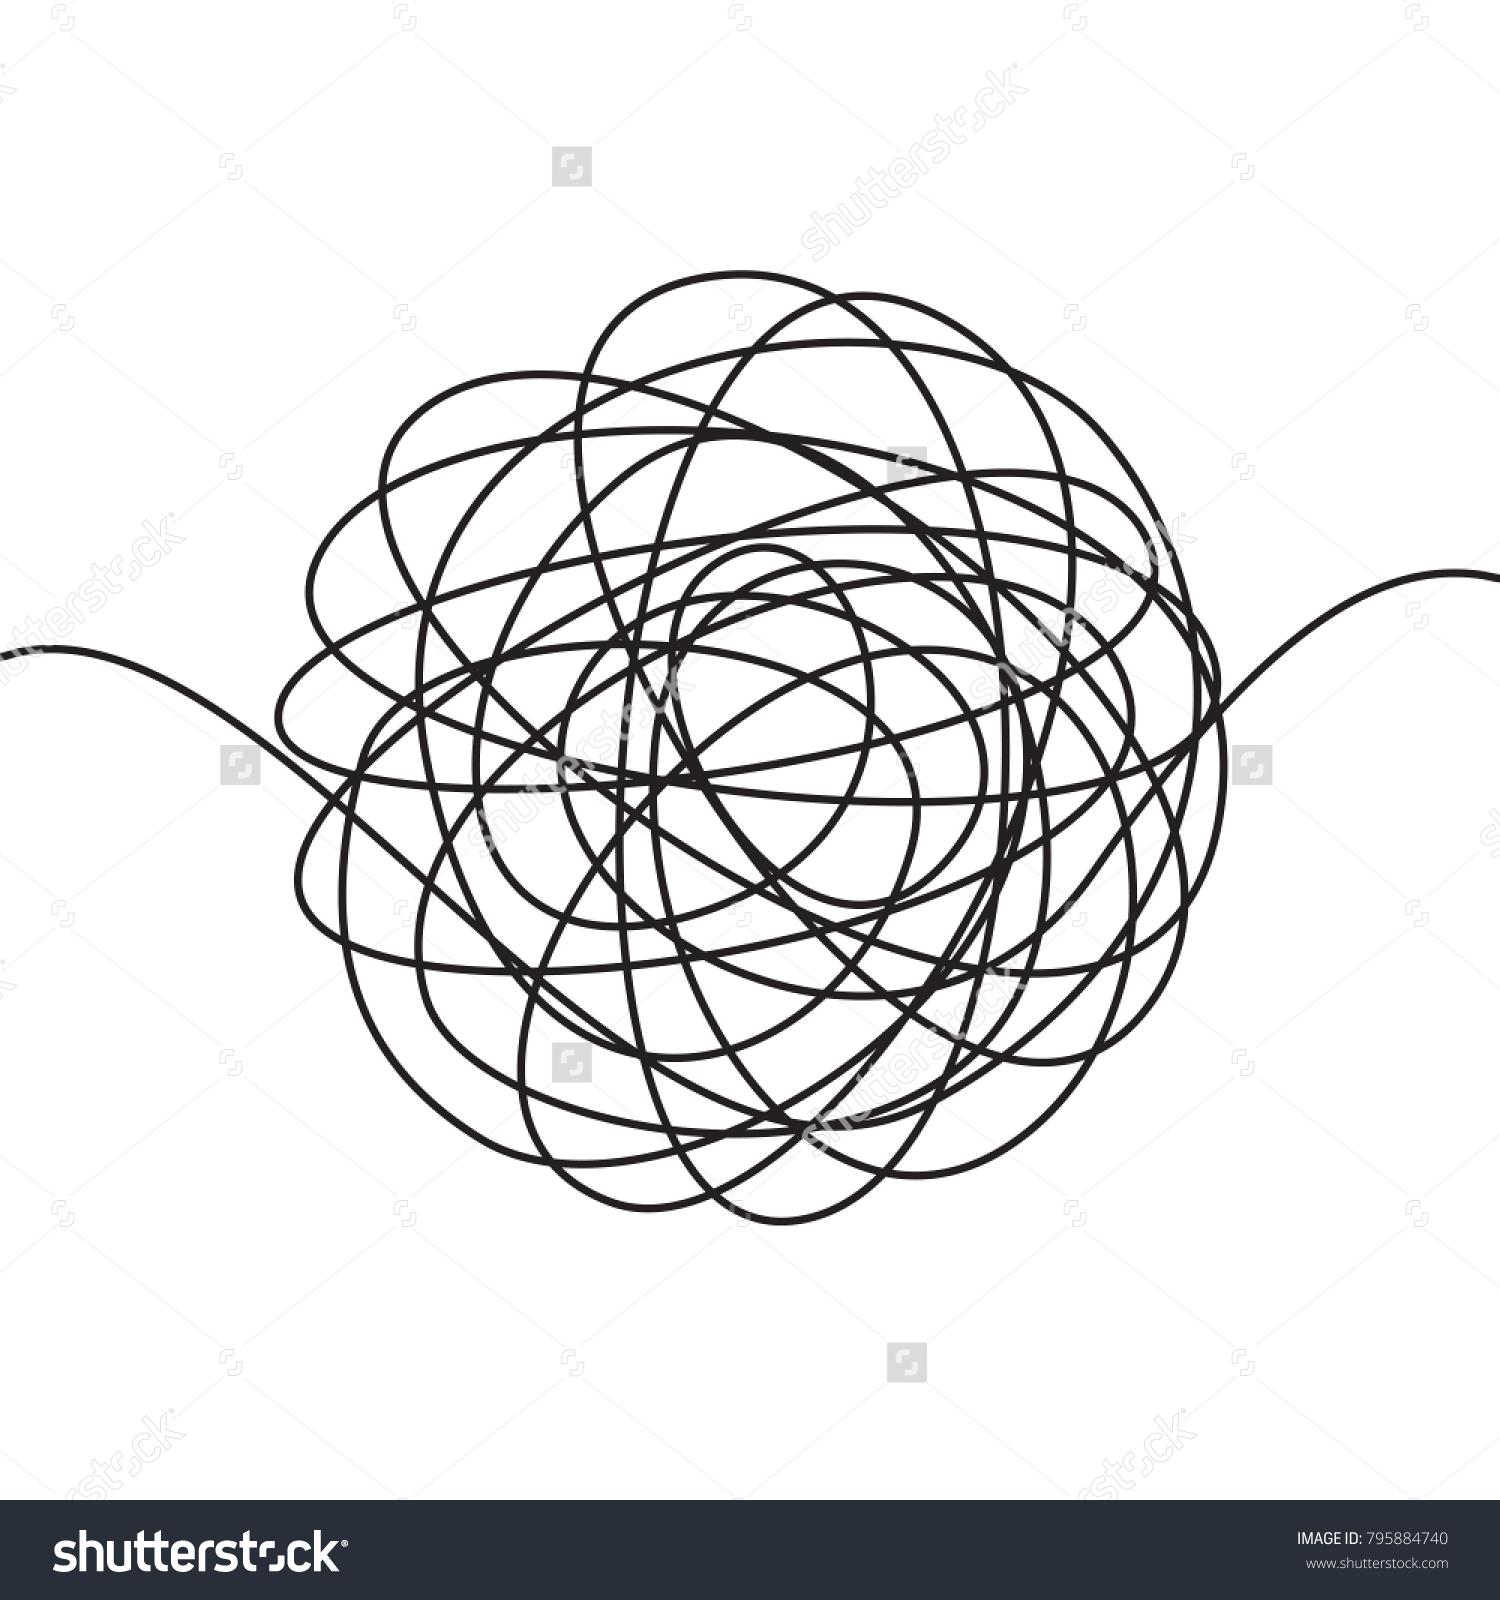 Hand drawn tangle scrawl sketch black stock vector hd royalty free